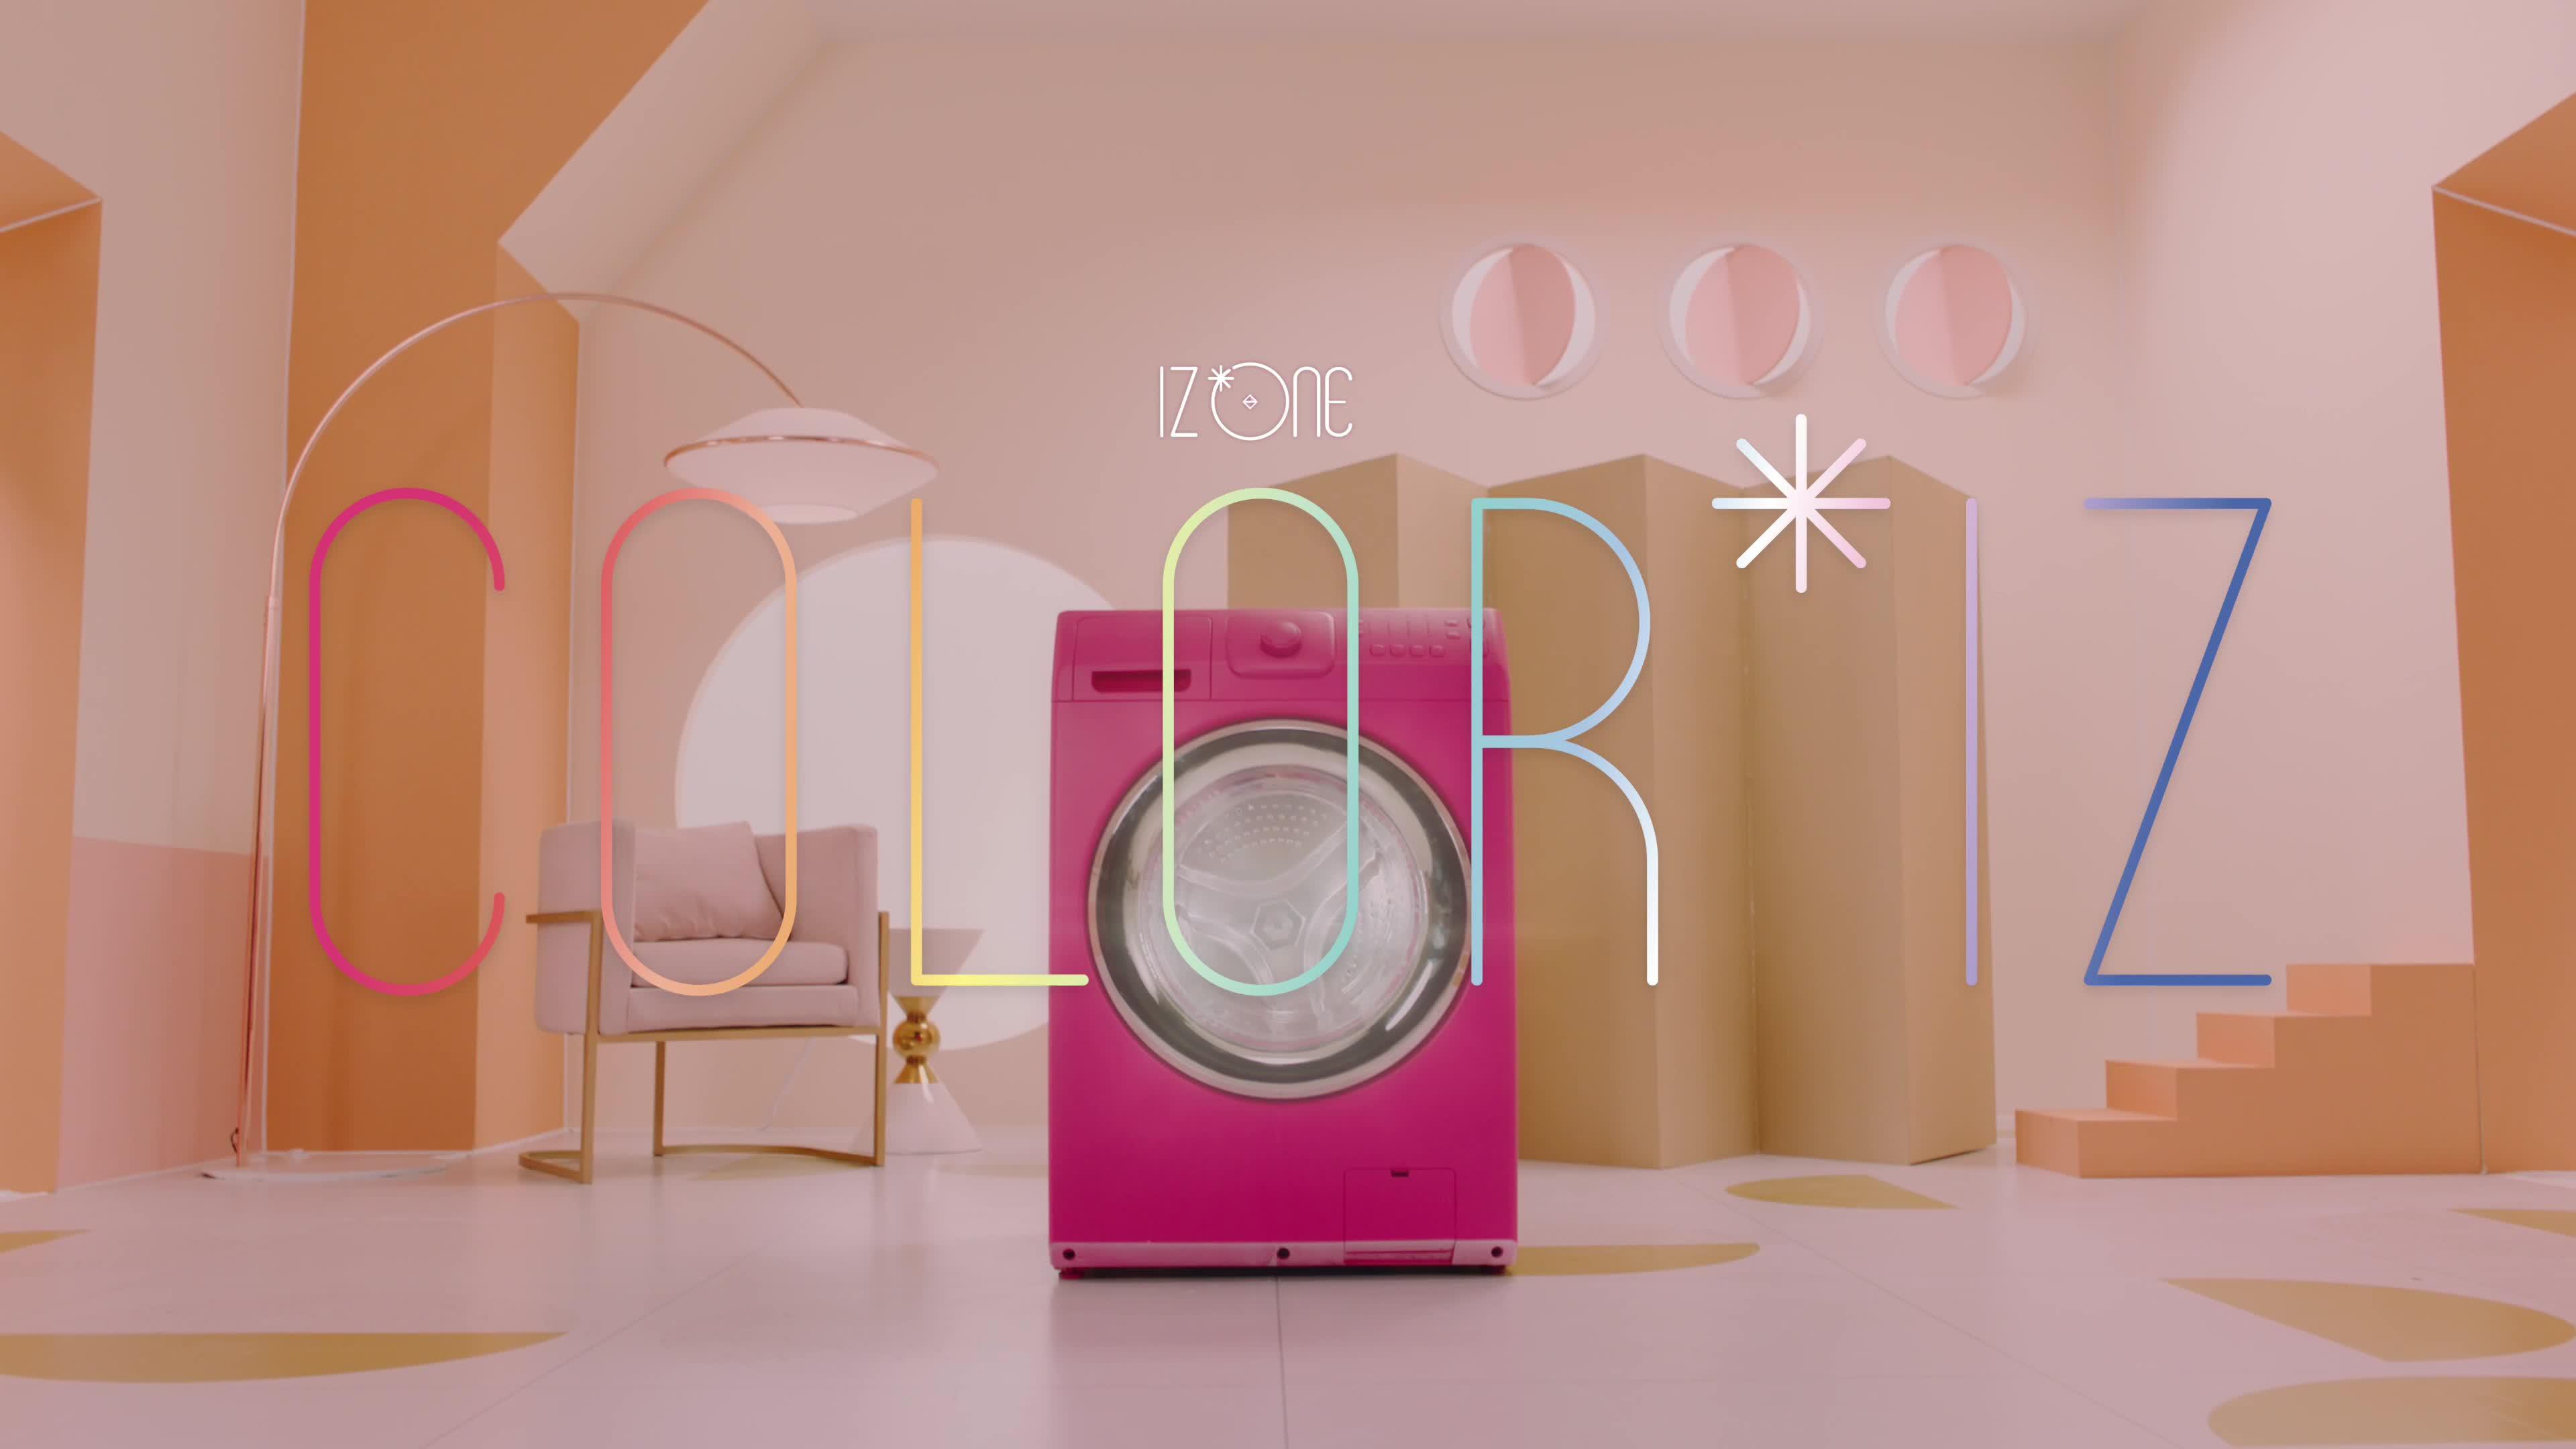 [V 독점] IZ*ONE (아이즈원) Concept Trailer : What IZ your color?